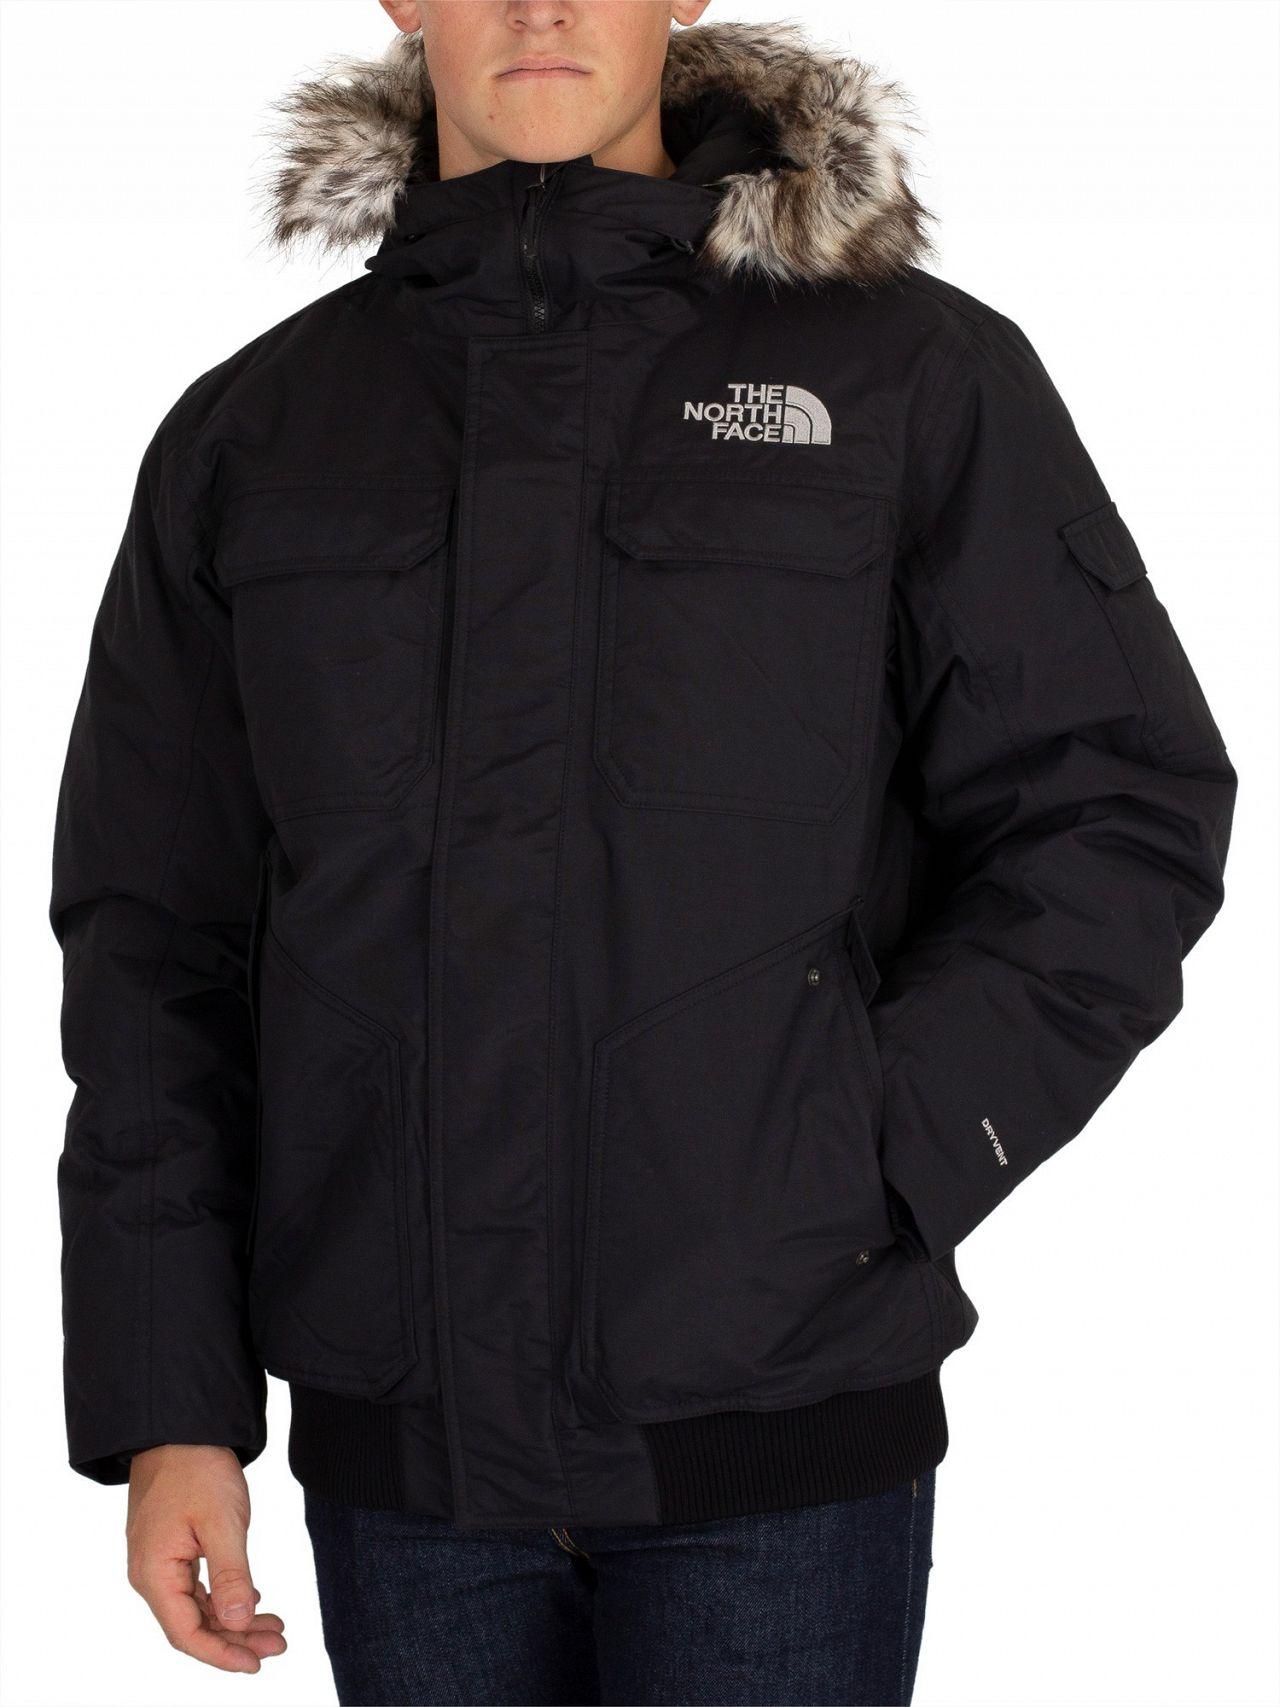 62ba3a5cc8b4 The North Face Black Gotham Jacket